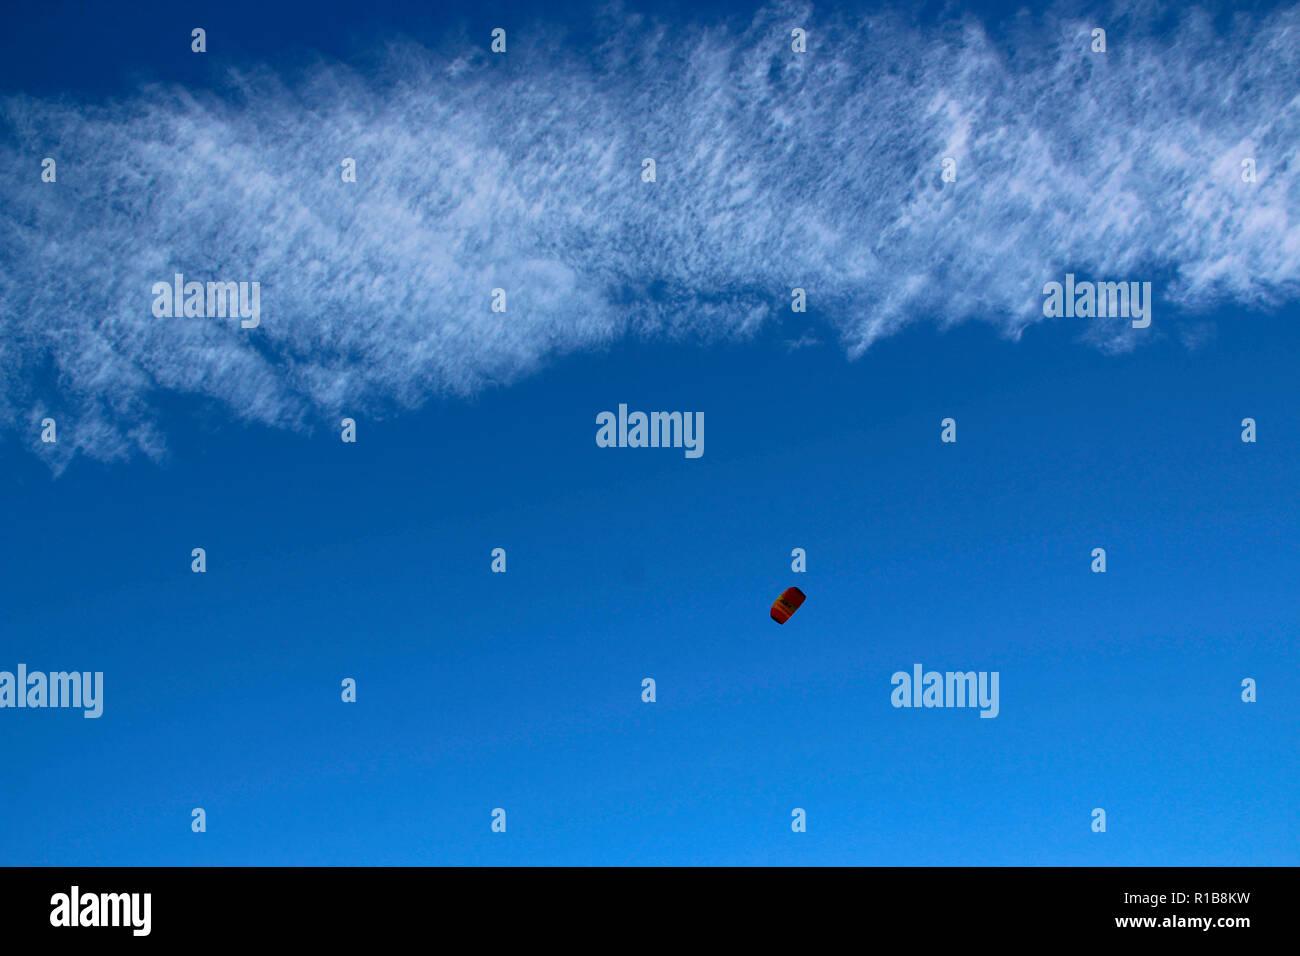 Lenkdrachen am blauen Himmel mit einigen Wolken. Fly a kite n a blue sky with a few nice clouds. - Stock Image